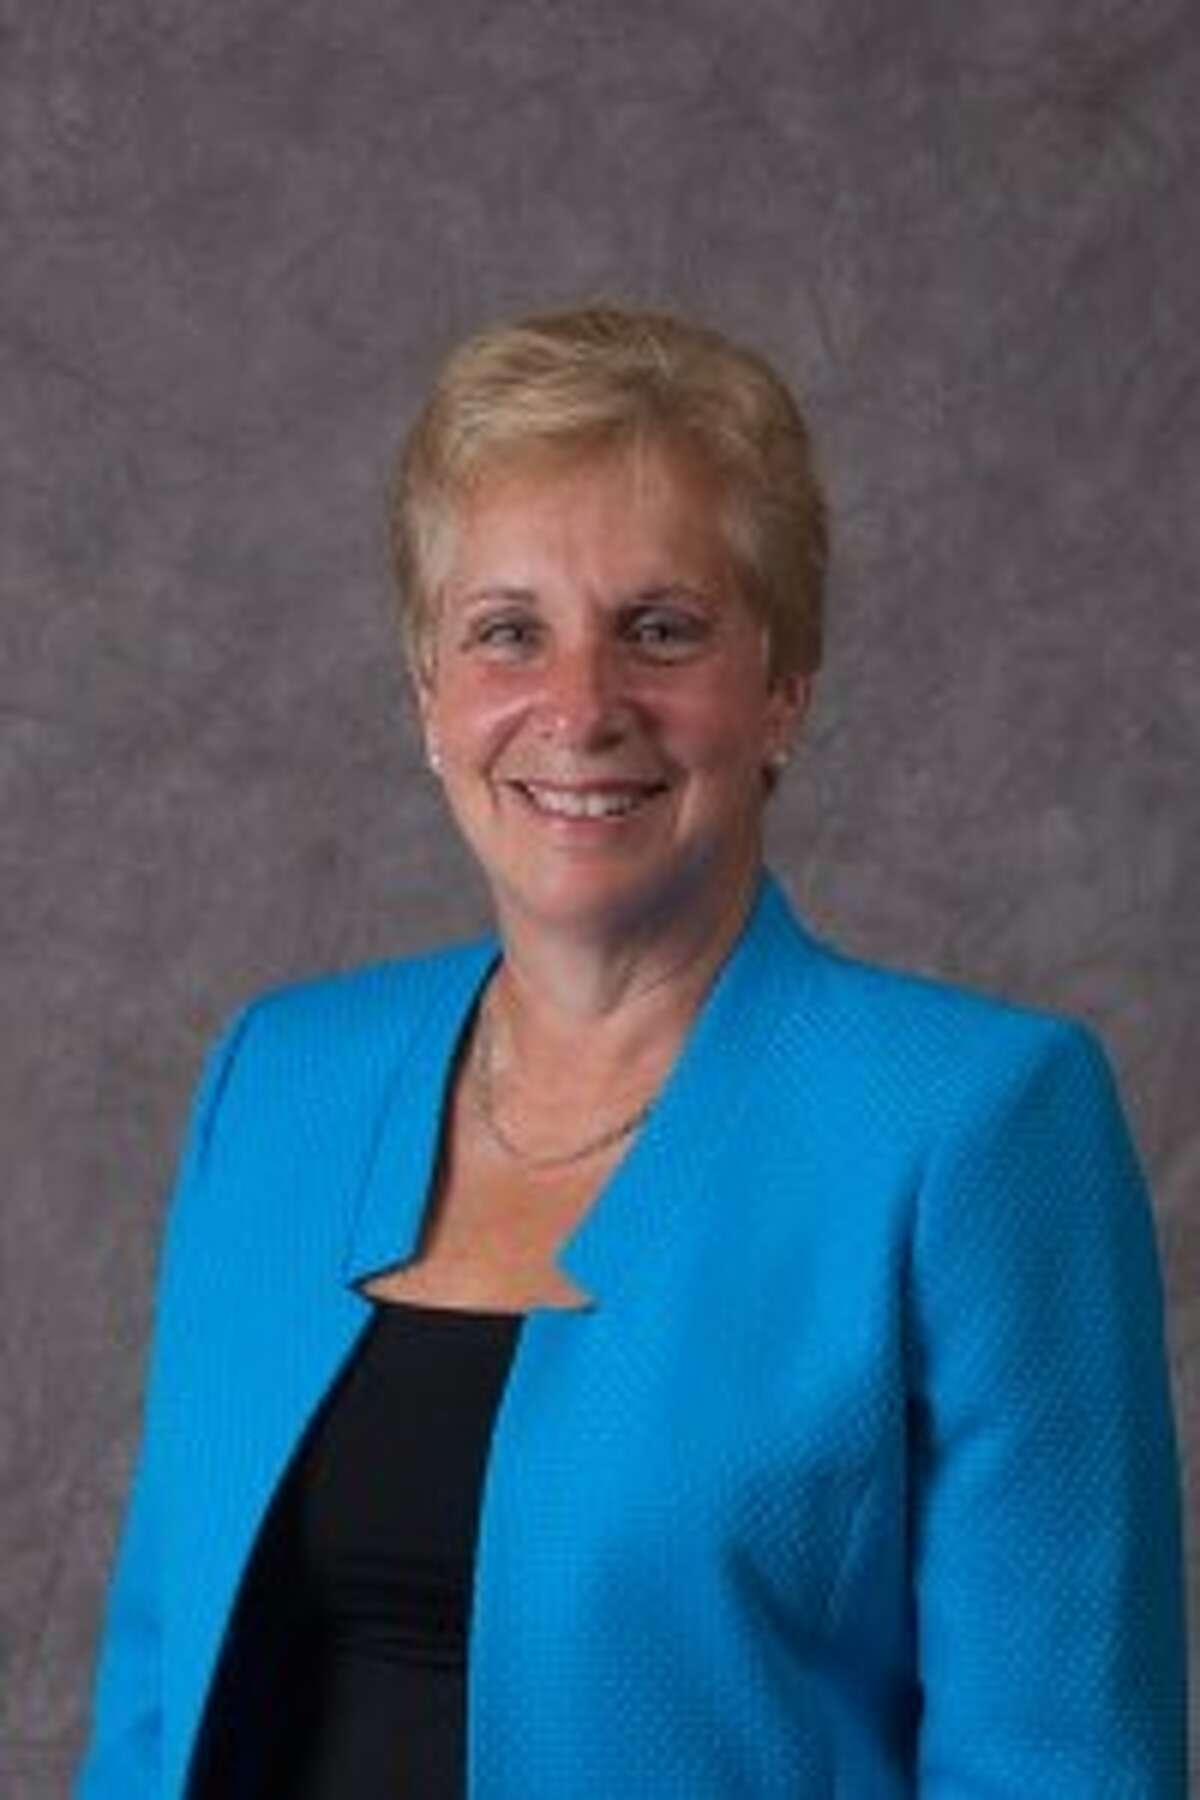 Vicki Tesoro